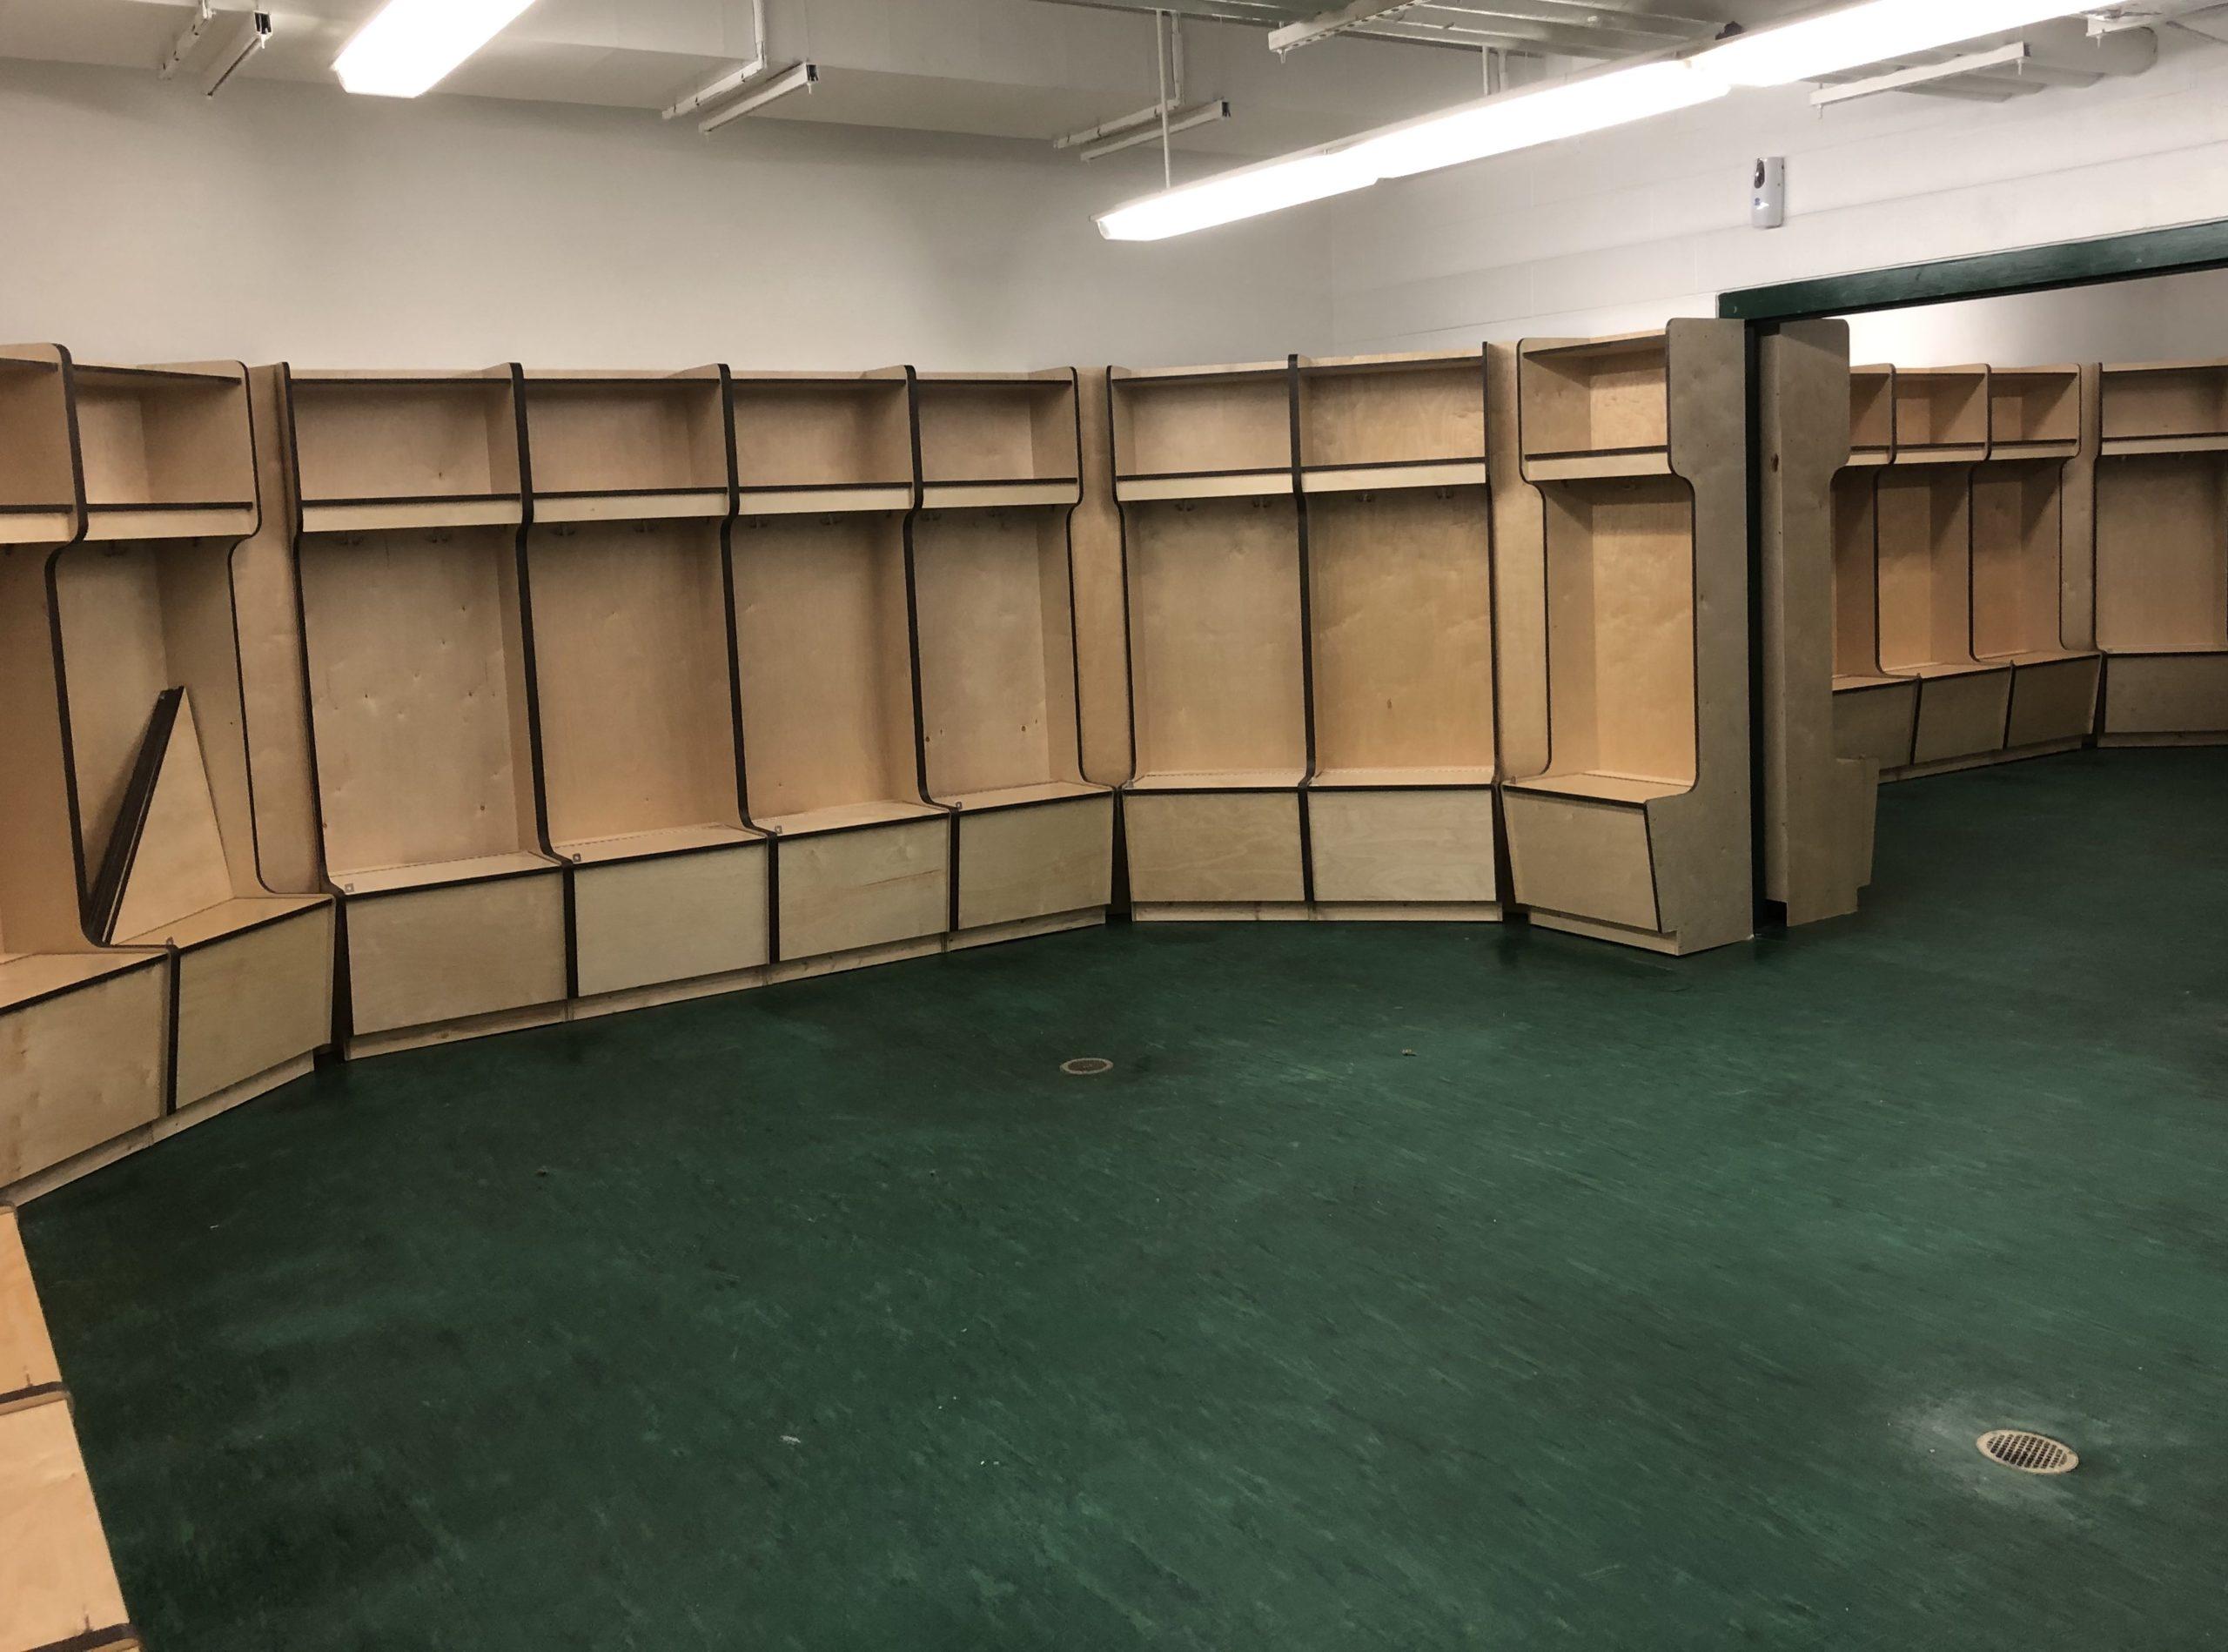 Plywood open front hockey lockers